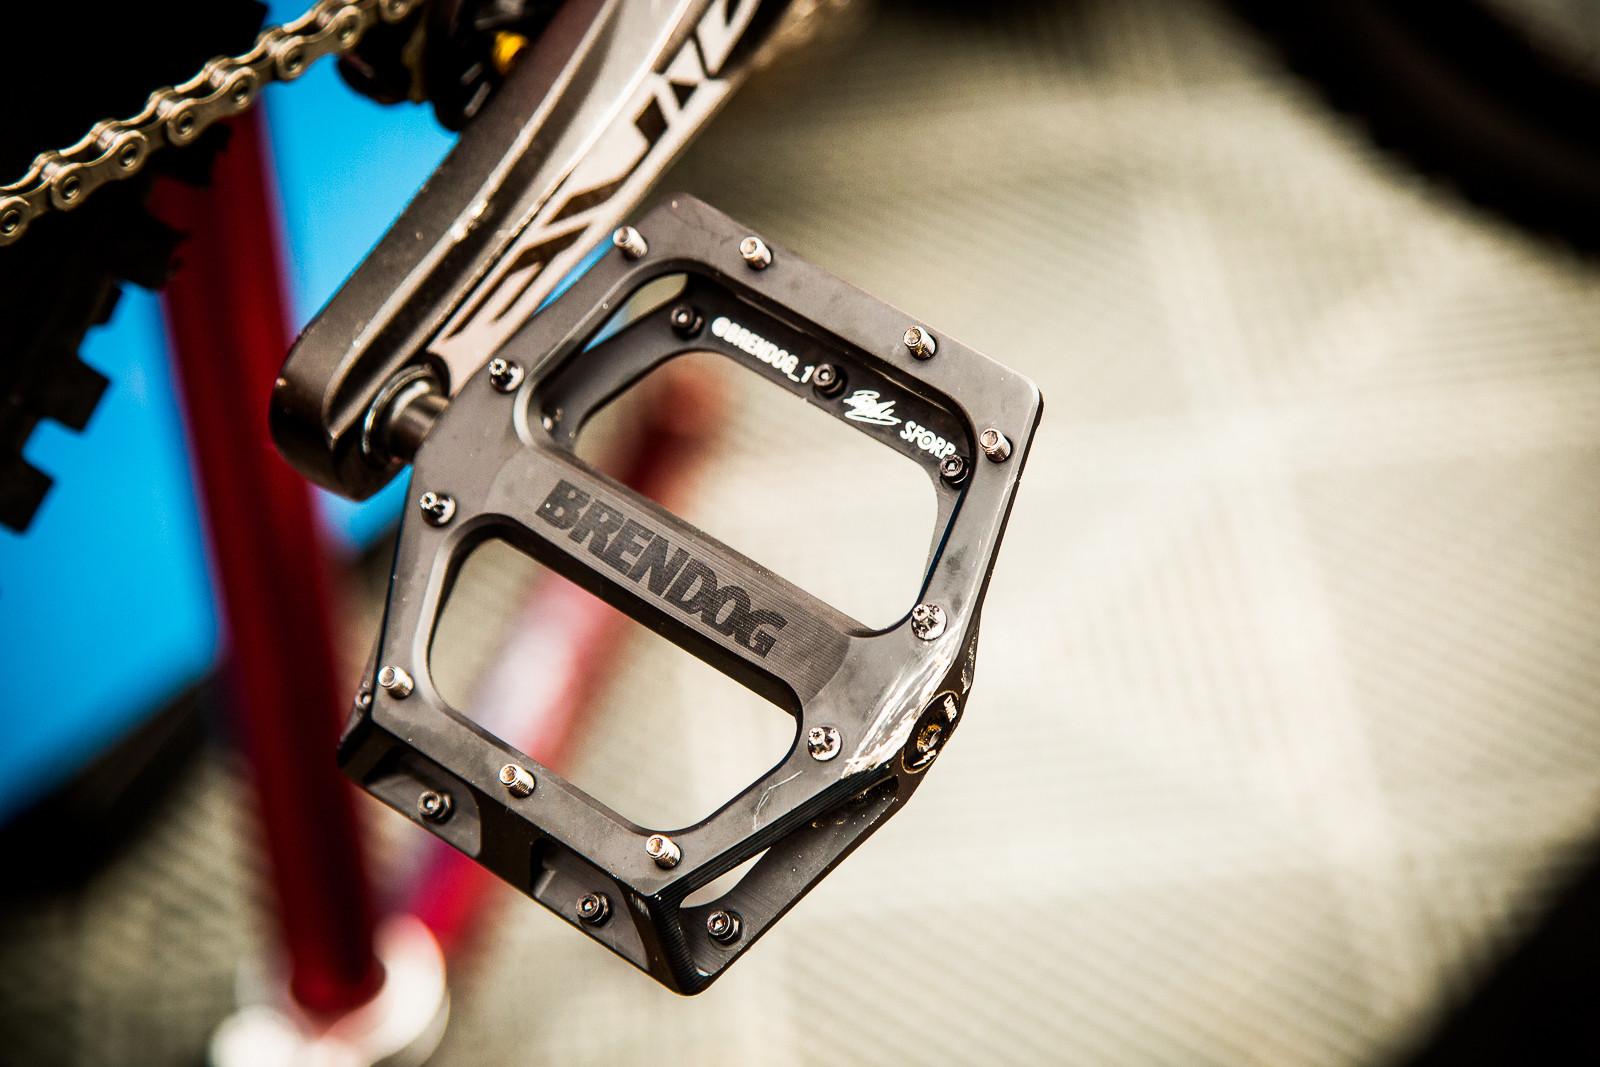 Brendog's DMR Pedals and Grips - PIT BITS - World Cup Lenzerheide, Switzerland - Mountain Biking Pictures - Vital MTB